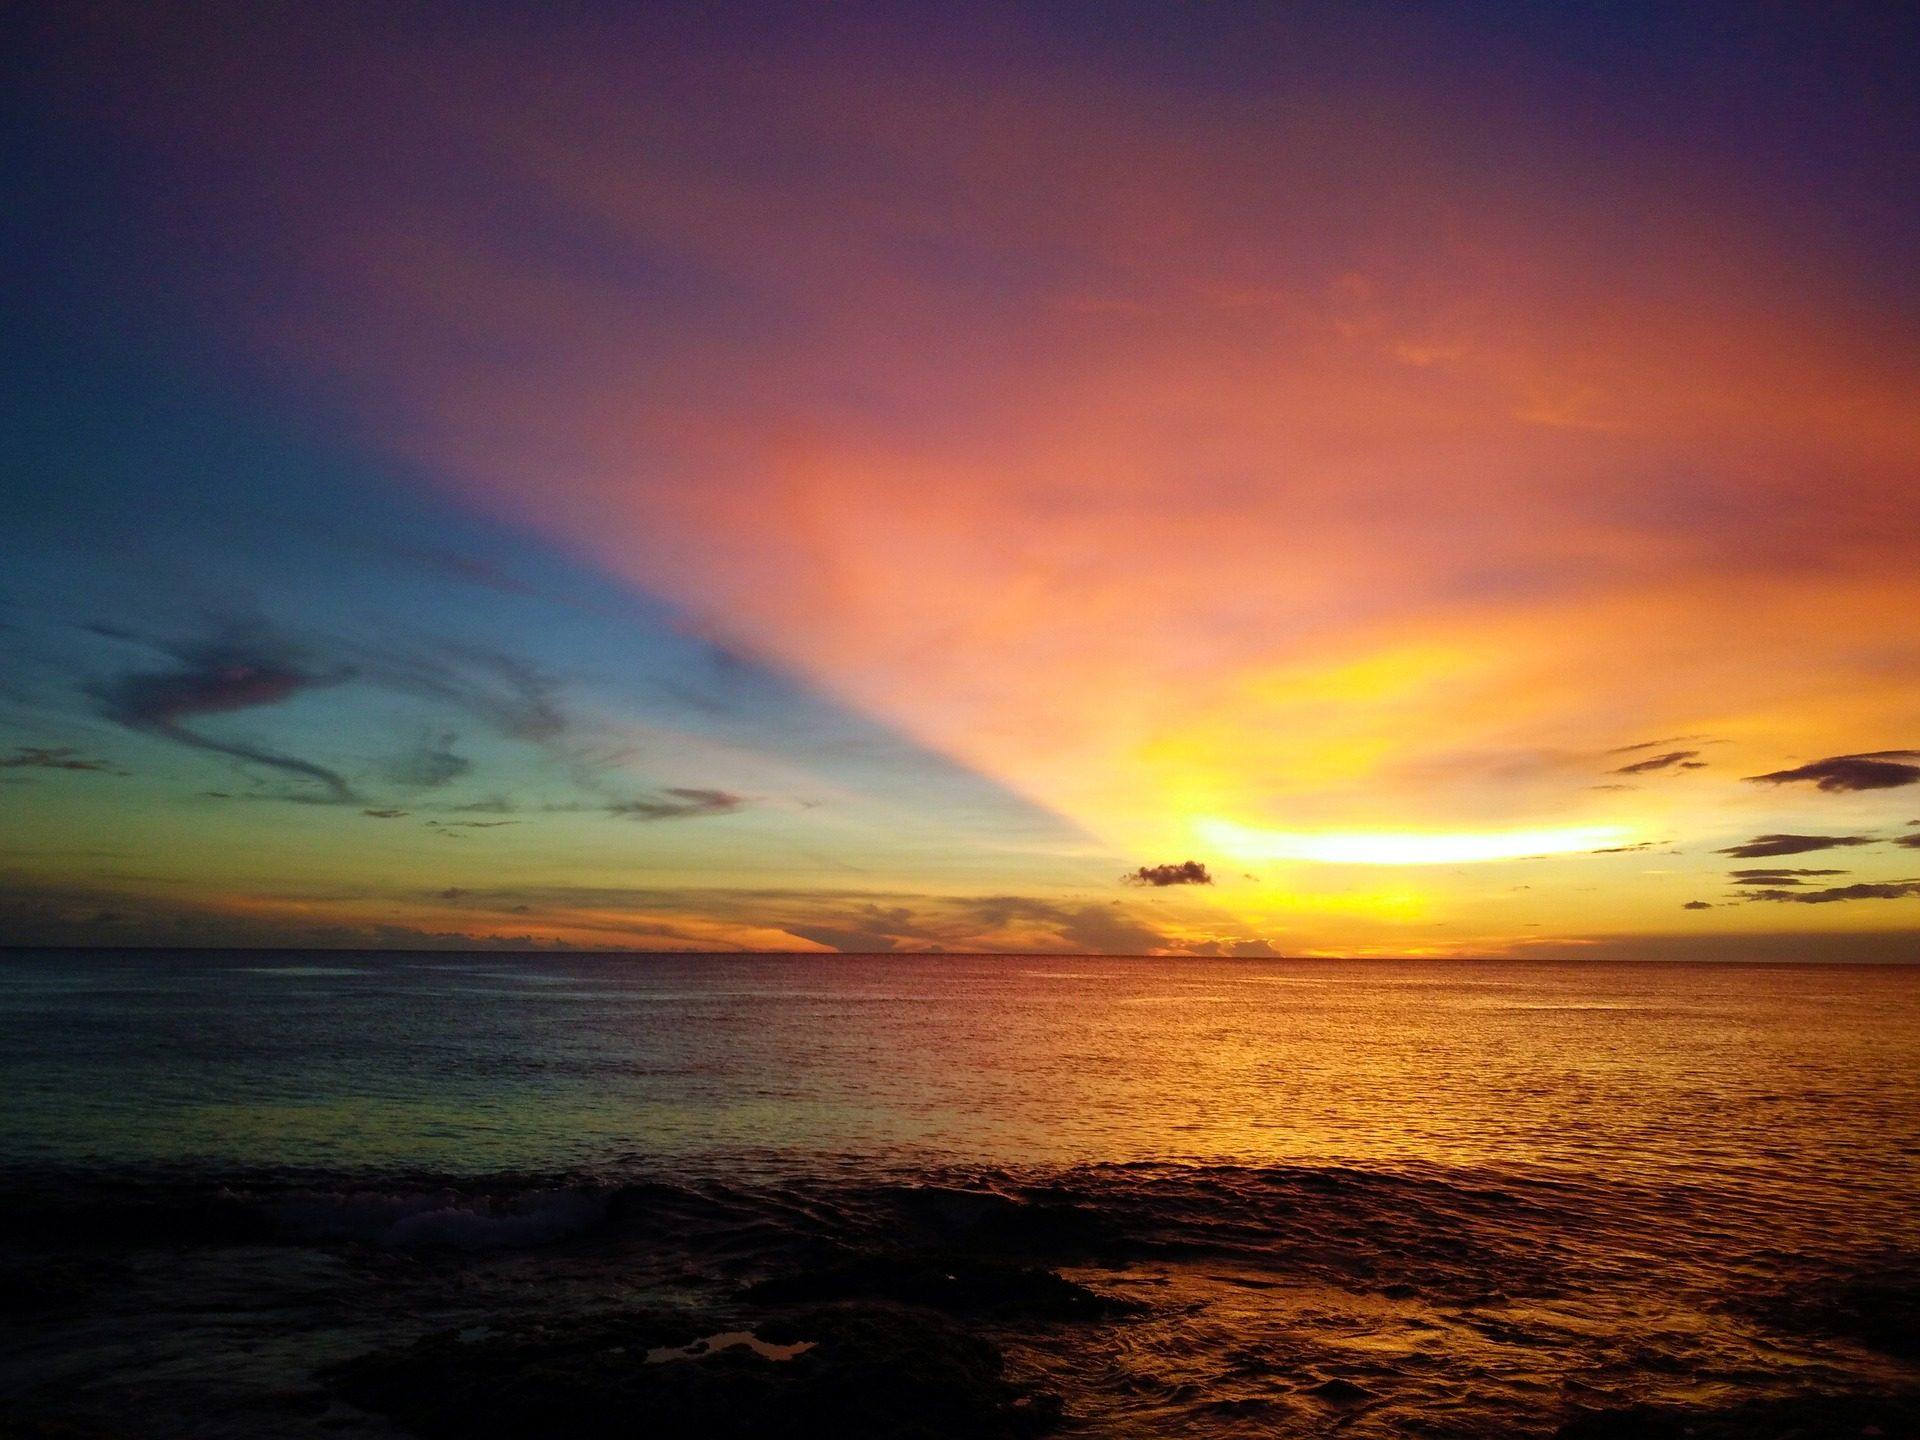 आकाश, tonalidad, रंगीन, सूर्यास्त, सागर, महासागर - HD वॉलपेपर - प्रोफेसर-falken.com